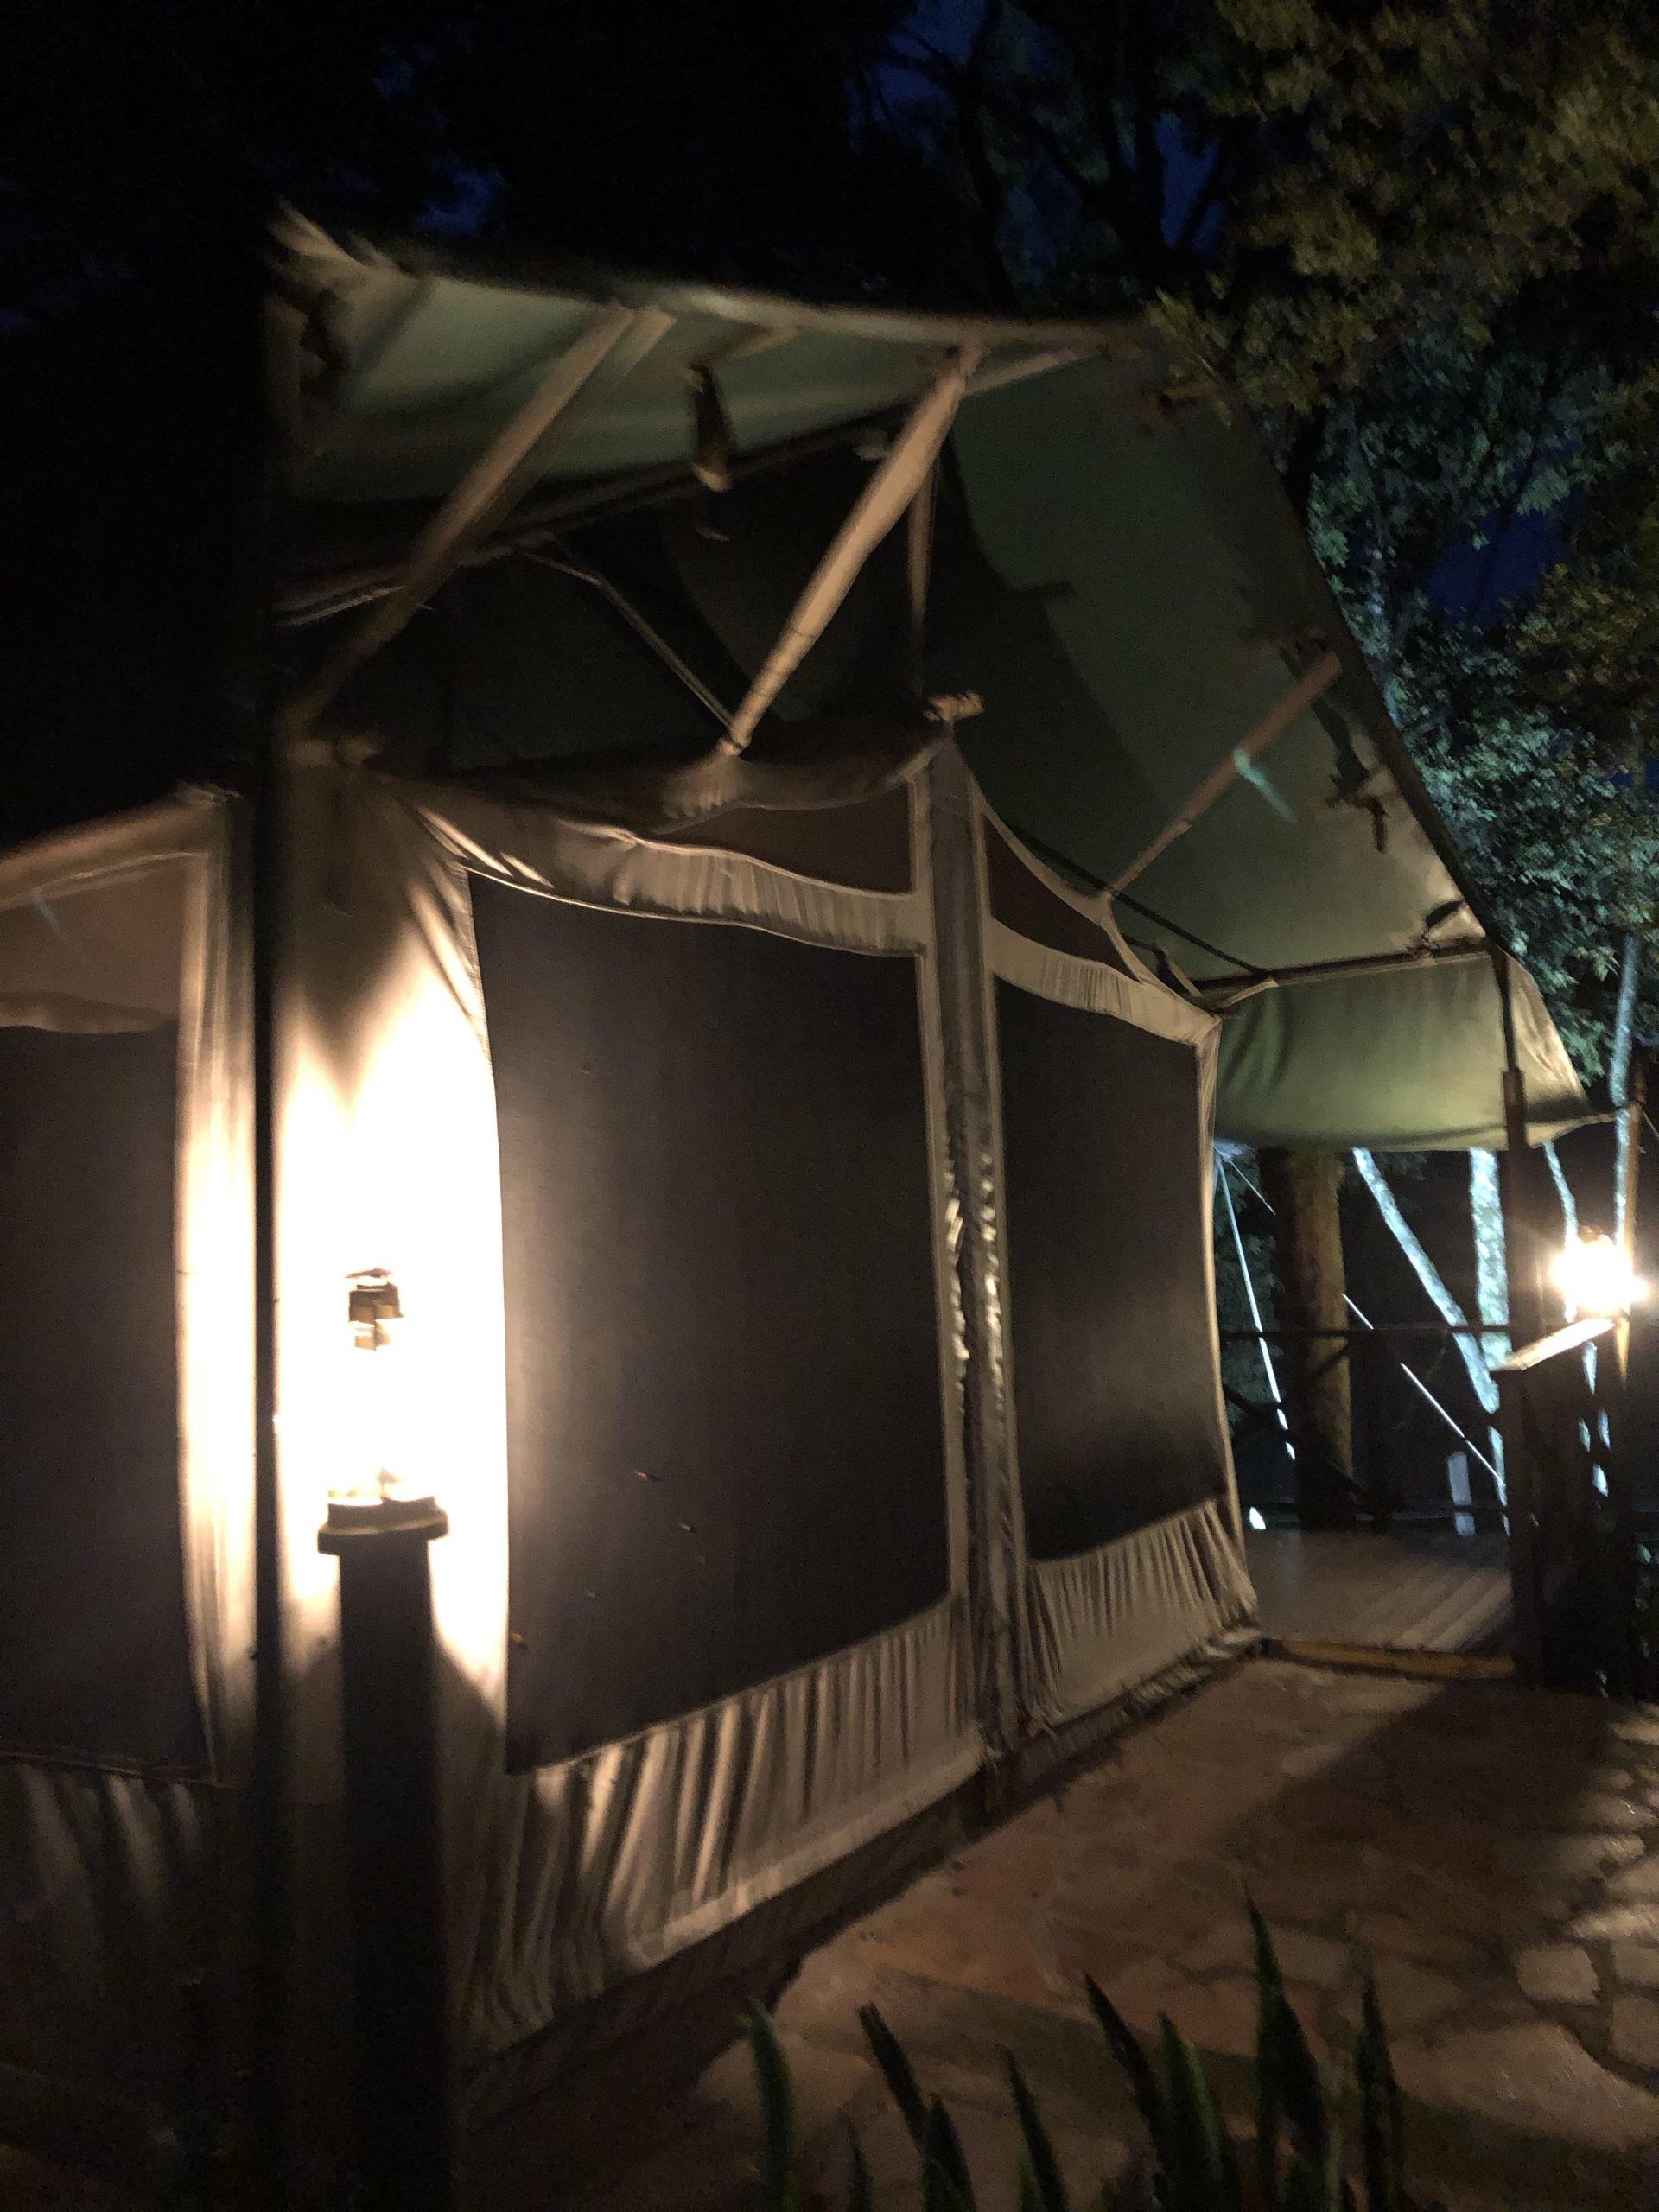 night view of luxury tent at Maasai Mara